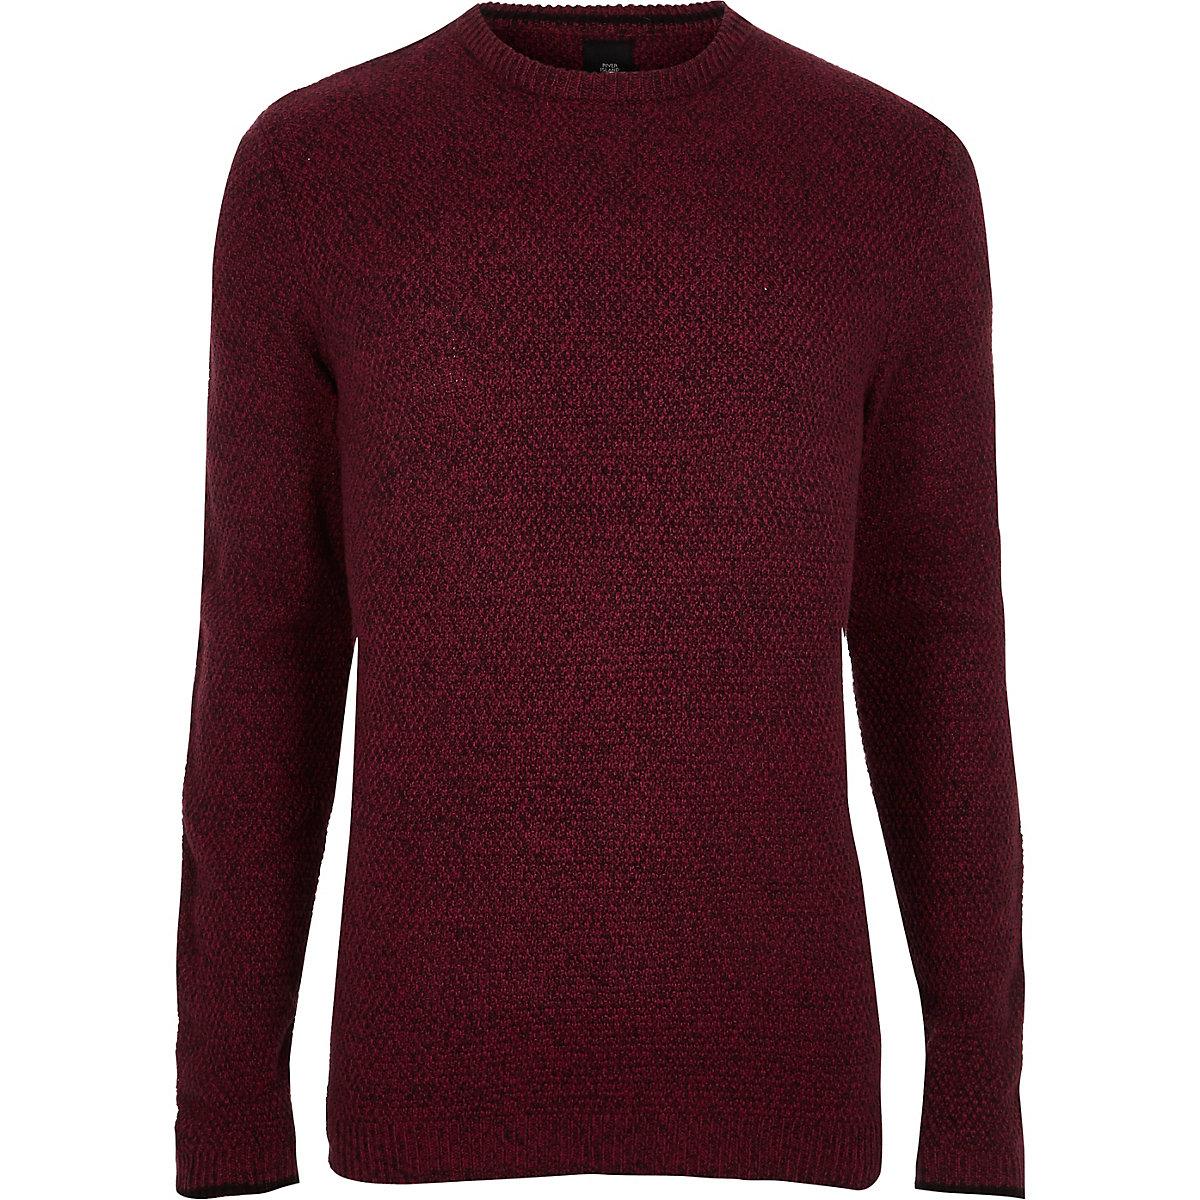 Red textured knit slim fit crew neck jumper